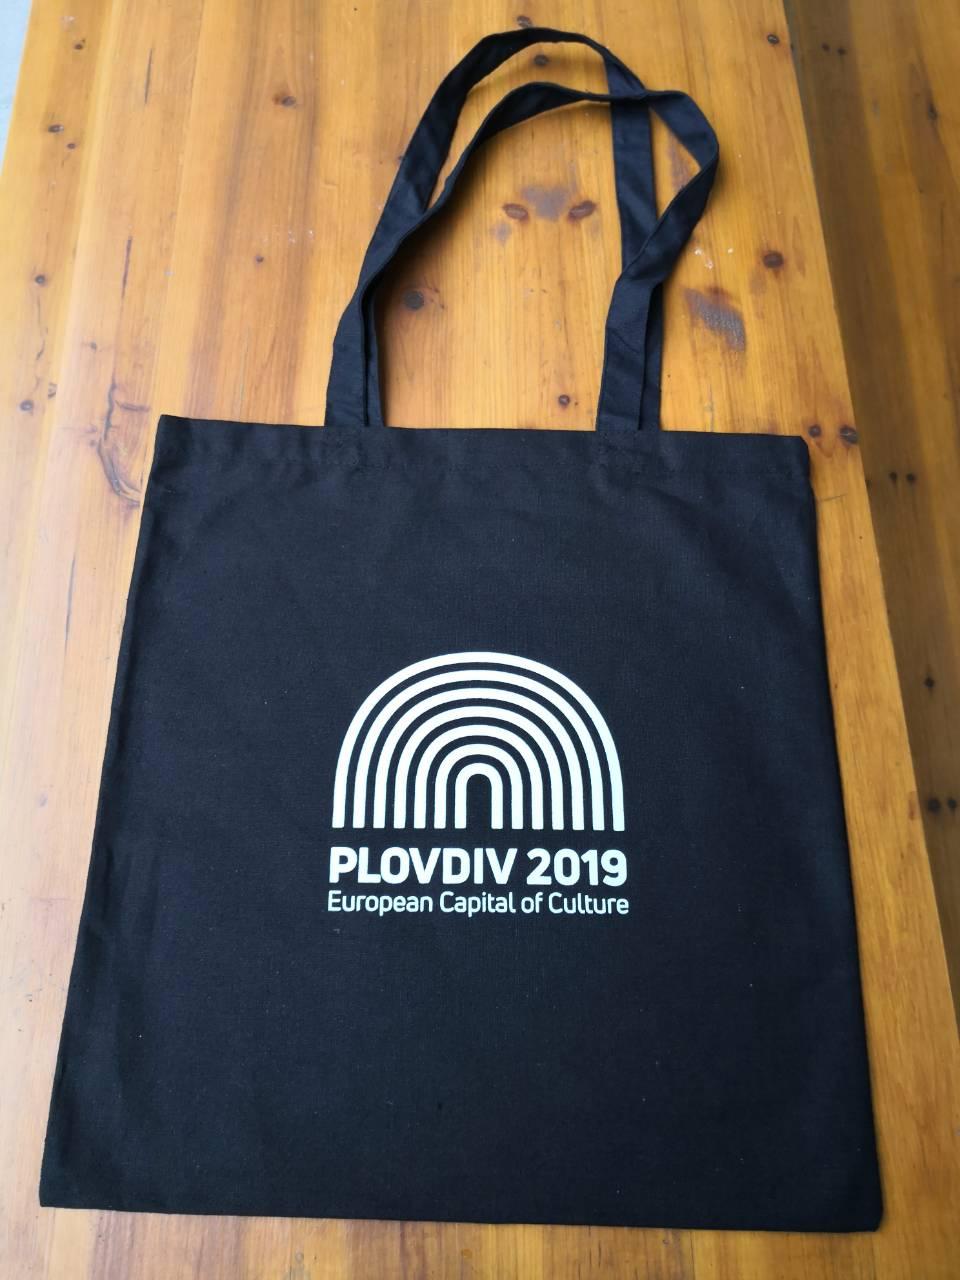 клиент: Община Пловдив